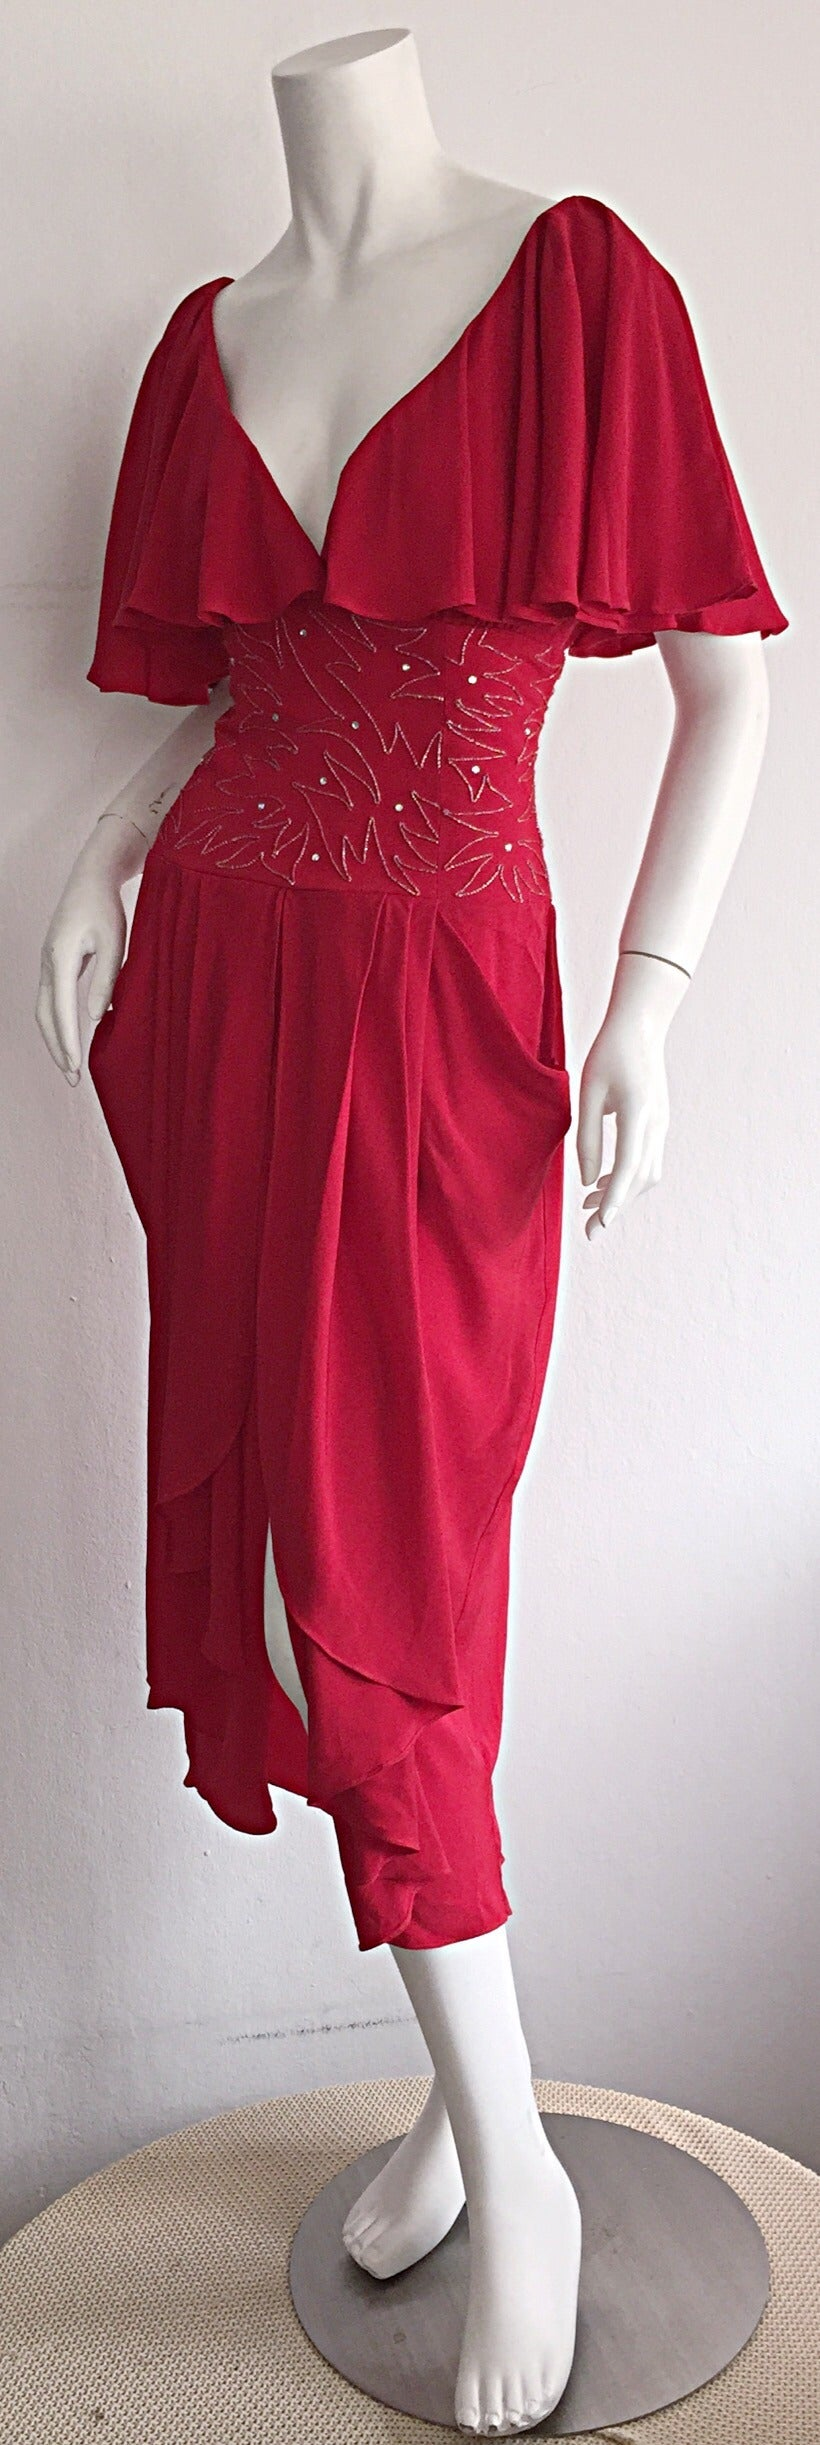 Women's Beautiful Vintage Eletra Casadei Lipstick Red Flutter Dress w/ Rhinestones For Sale